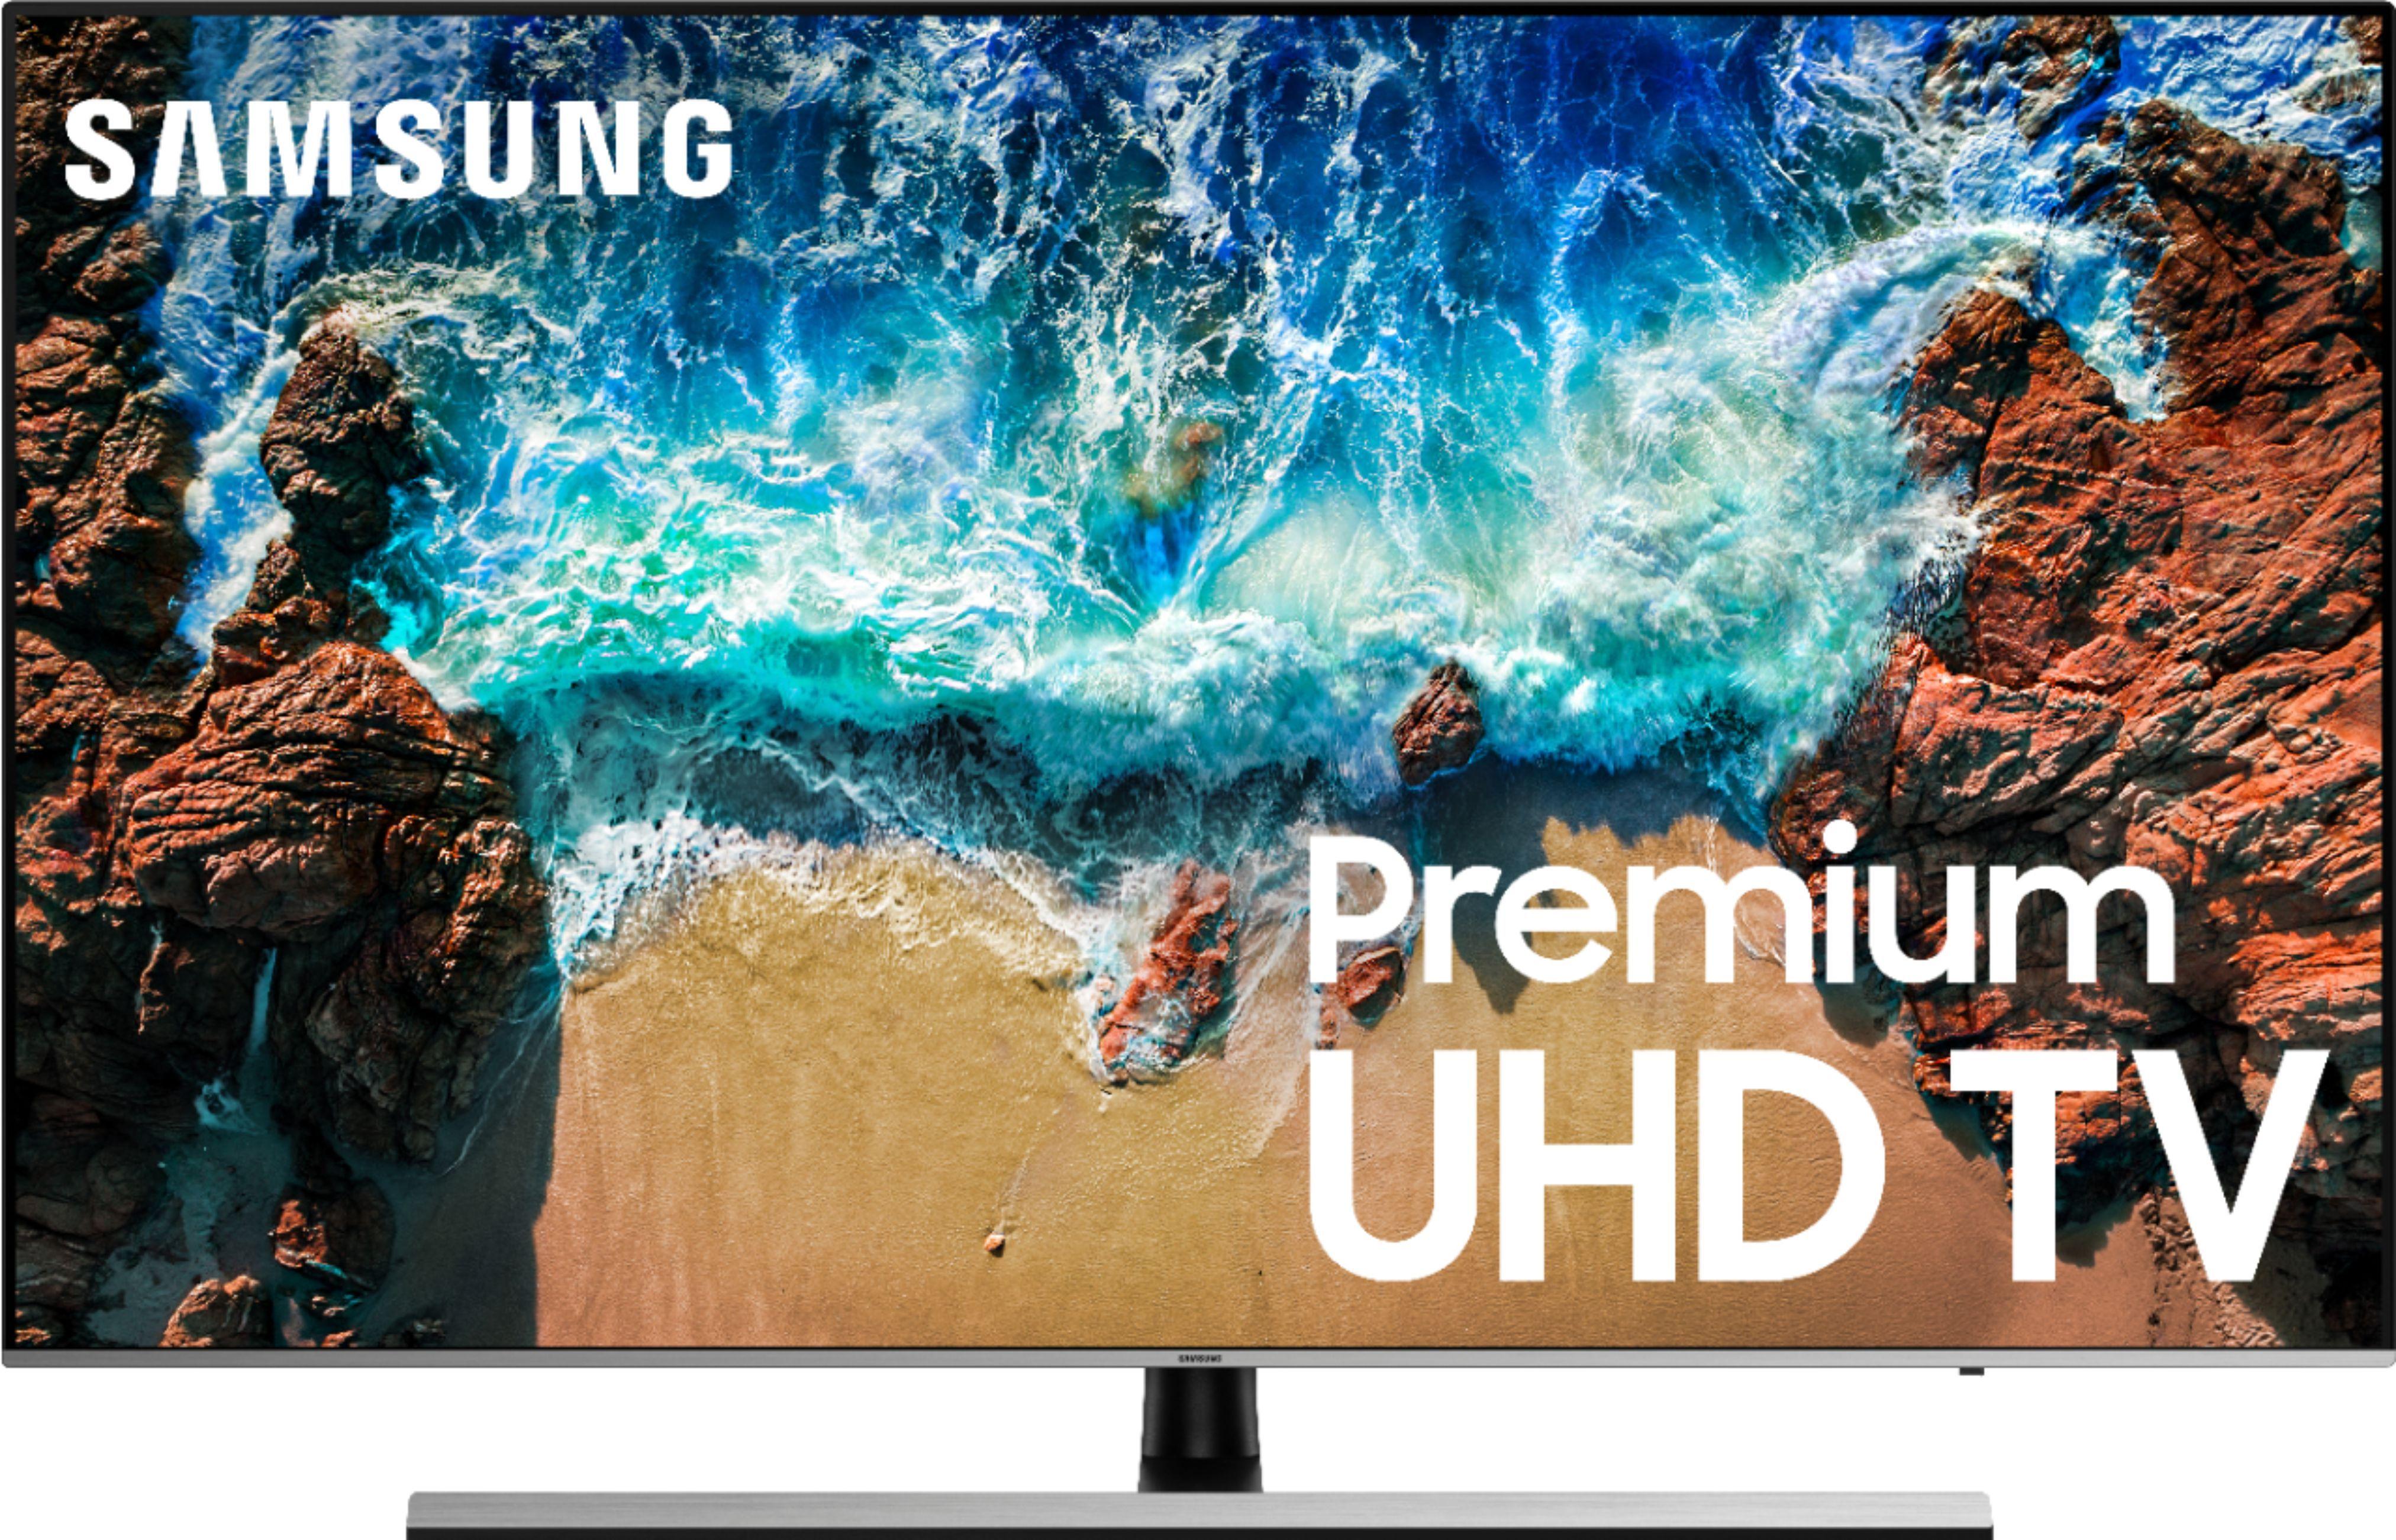 Best Buy Samsung 55 Class Led Nu8000 Series 2160p Smart 4k Uhd Tv With Hdr Un55nu8000fxza Uhd Tv Smart Tv 4k Ultra Hd Tvs